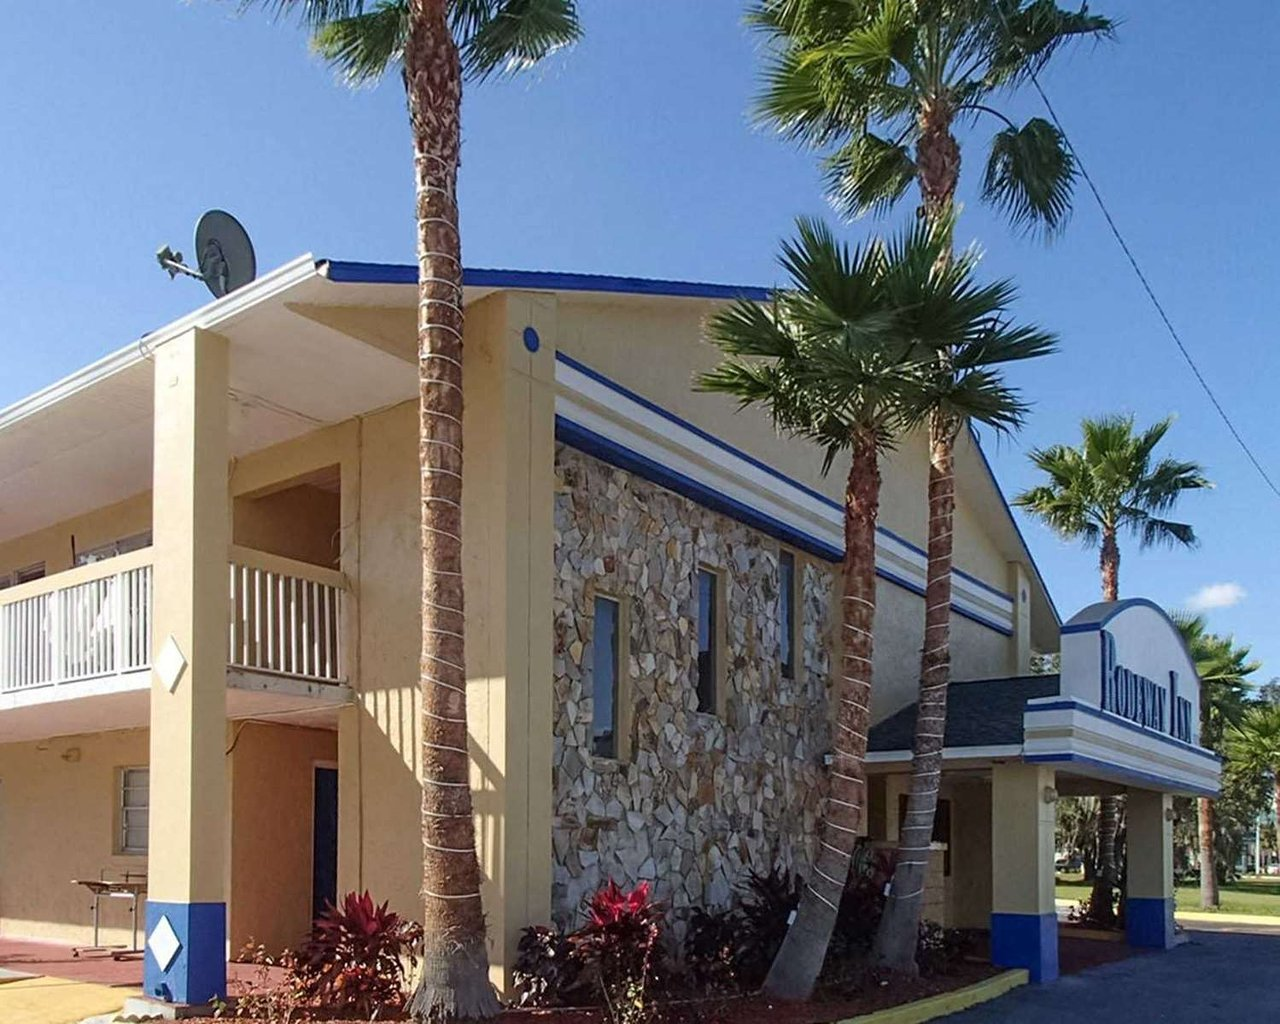 Rodeway Inn 60 7 2 Updated 2018 Prices Motel Reviews Leesburg Fl Tripadvisor